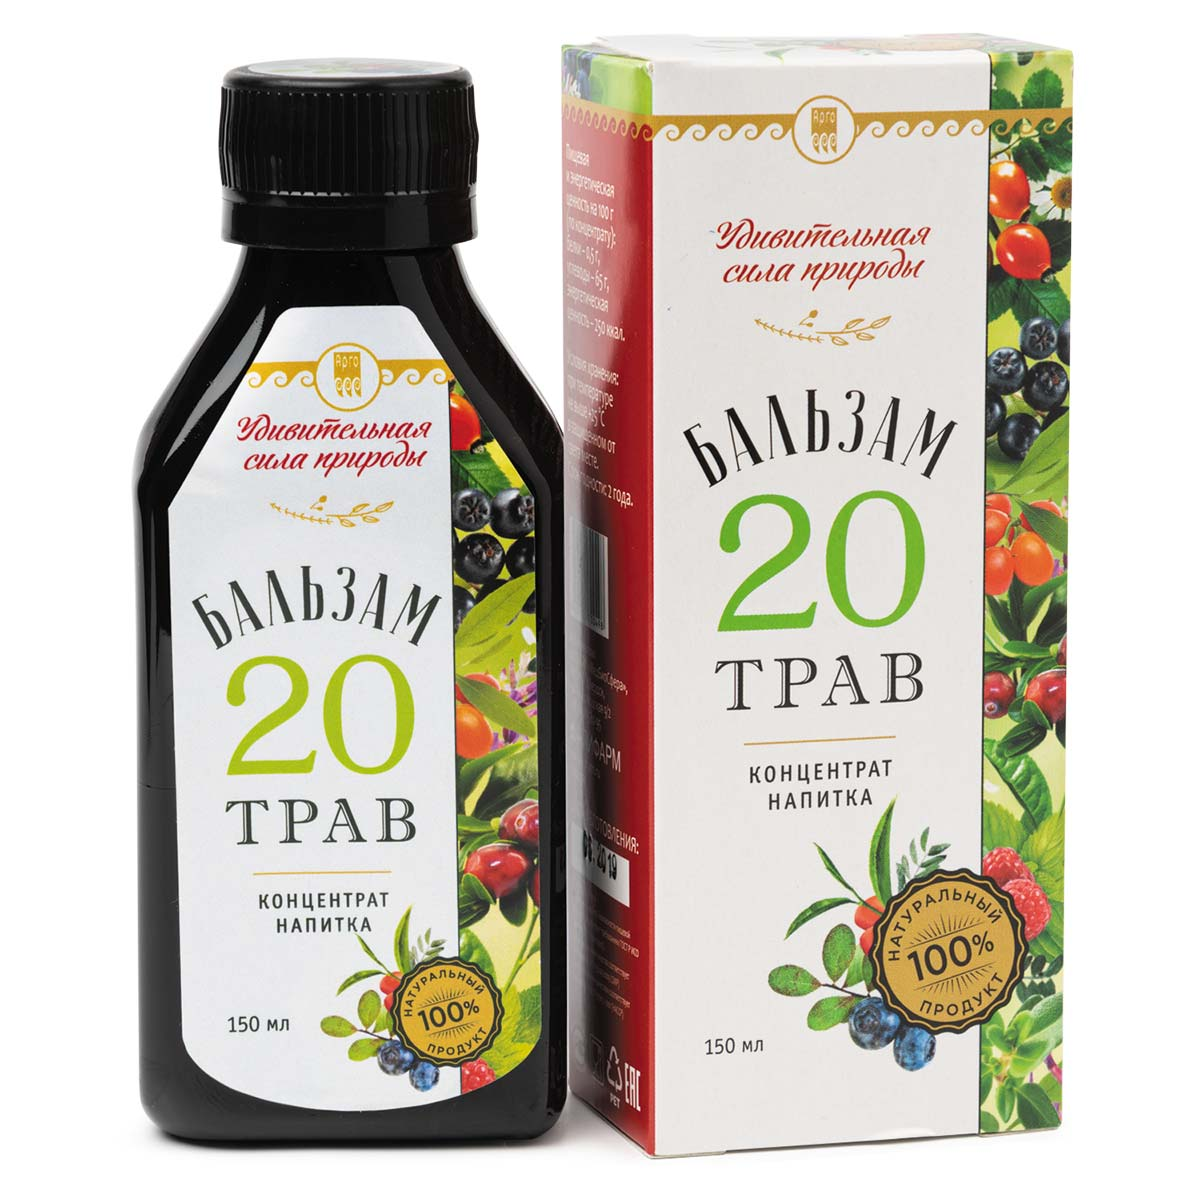 Концентрат напитка «Бальзам 20 трав»